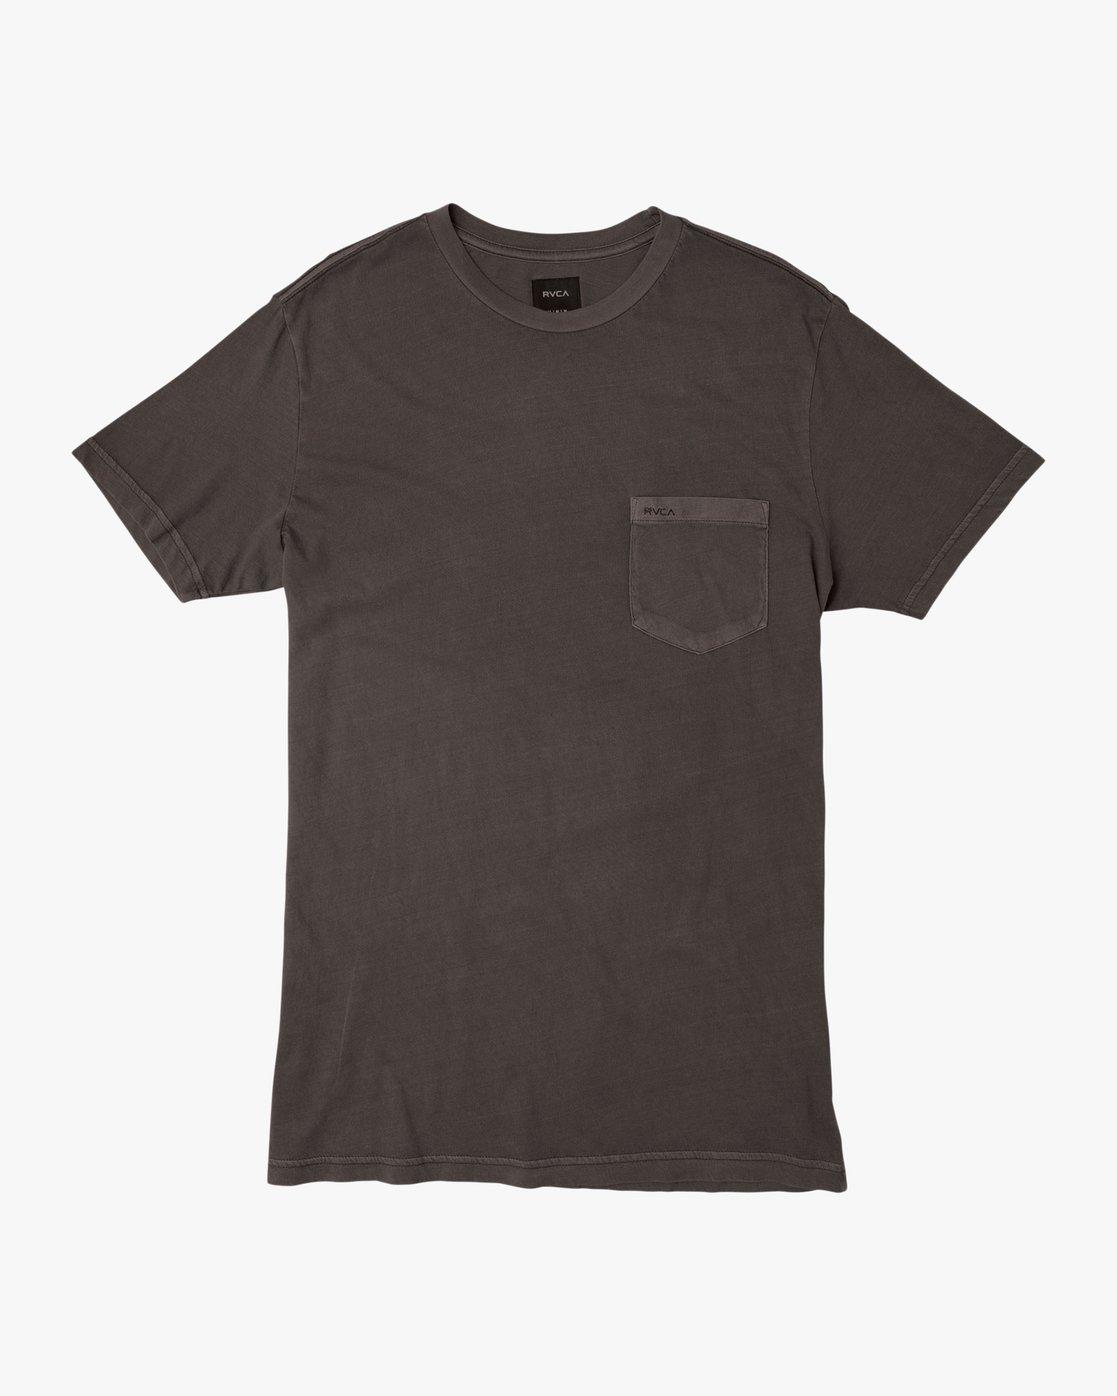 0 Ptc 2 Pigment T-Shirt Black M3910PTC RVCA